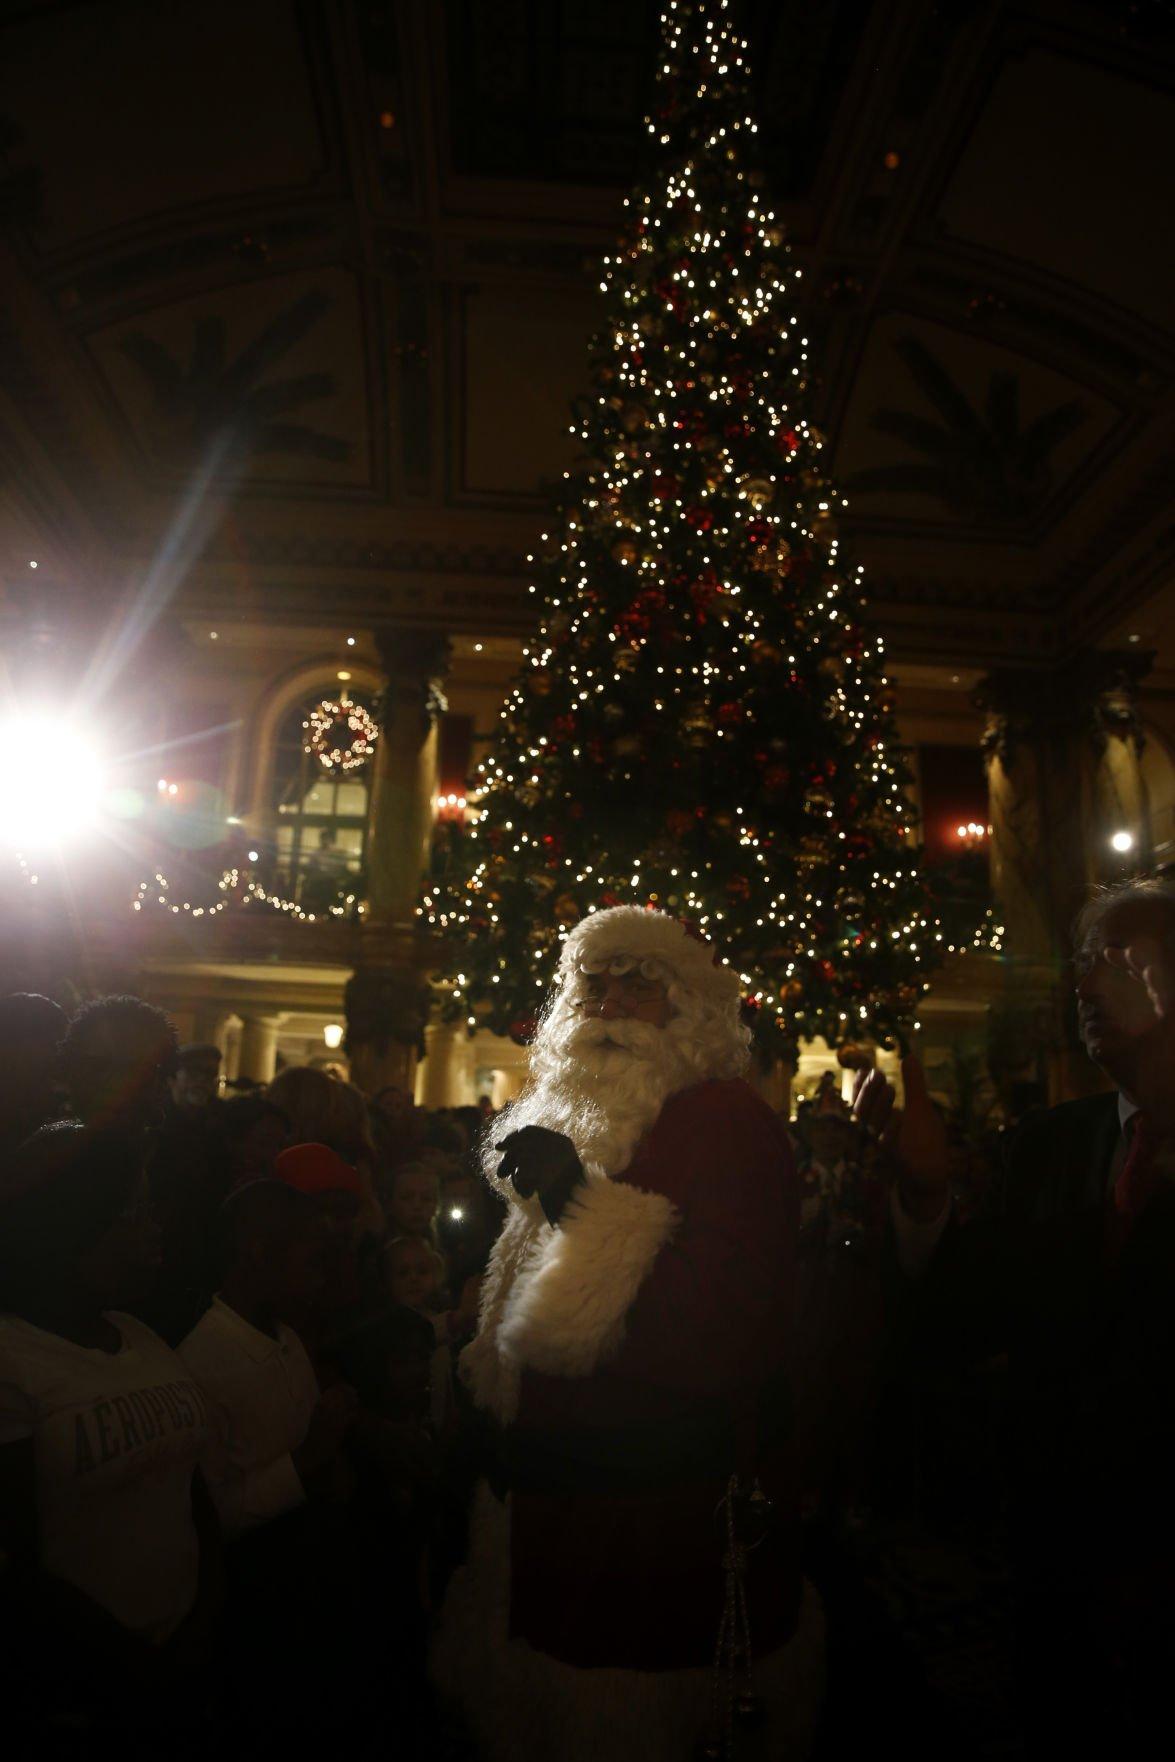 Jefferson Hotel tree lighting kicks off holiday season